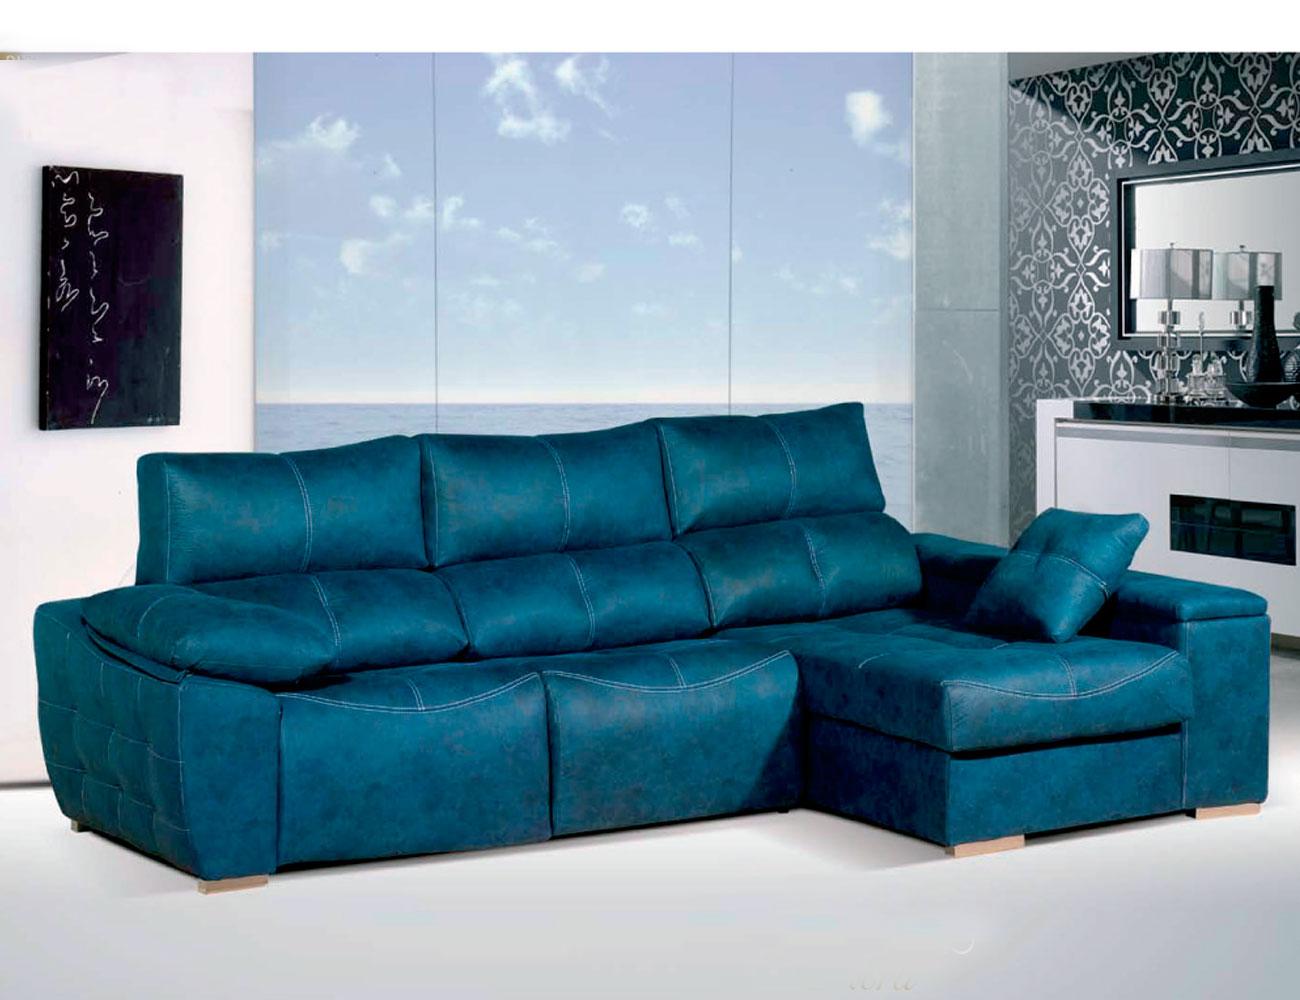 Sofa chaiselongue relax 2 motores anti manchas turquesa47